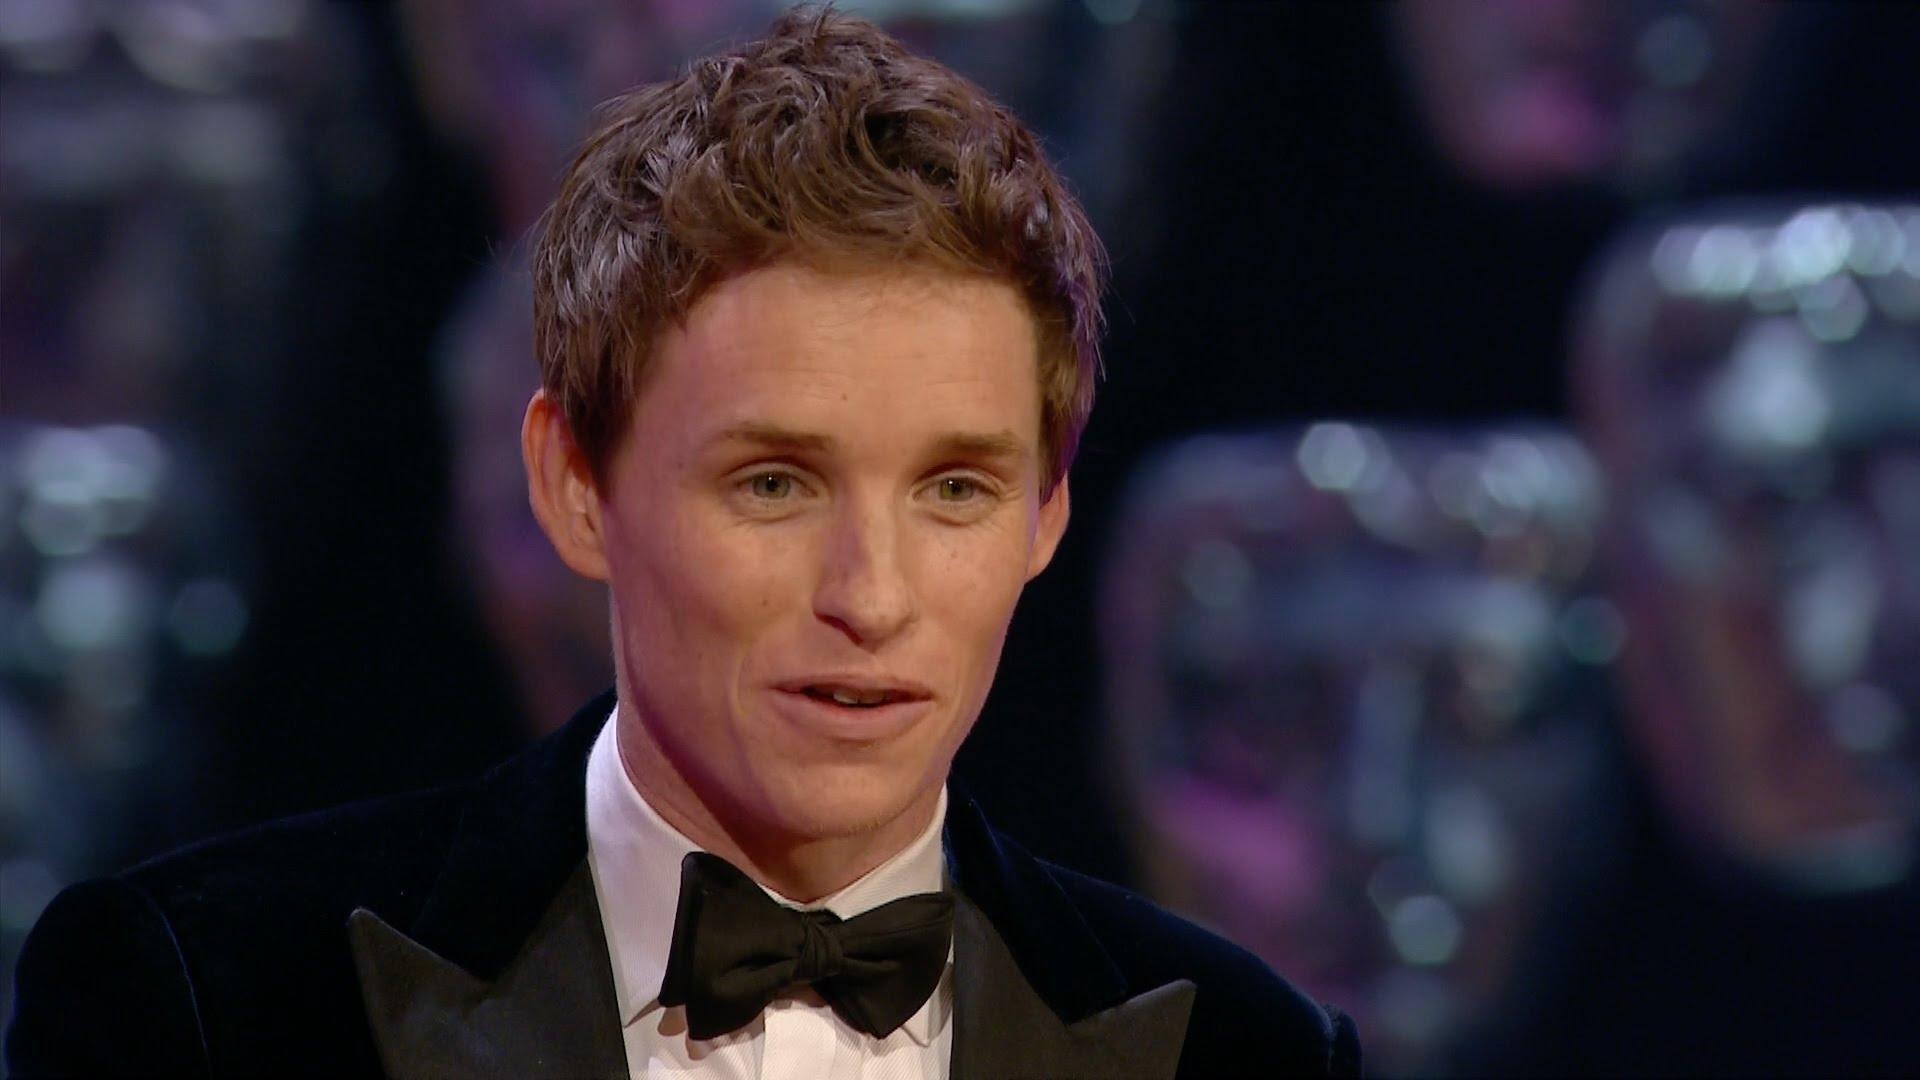 Eddie Redmayne wins Leading Actor BAFTA - The British Academy Film Awards 2015 - BBC One